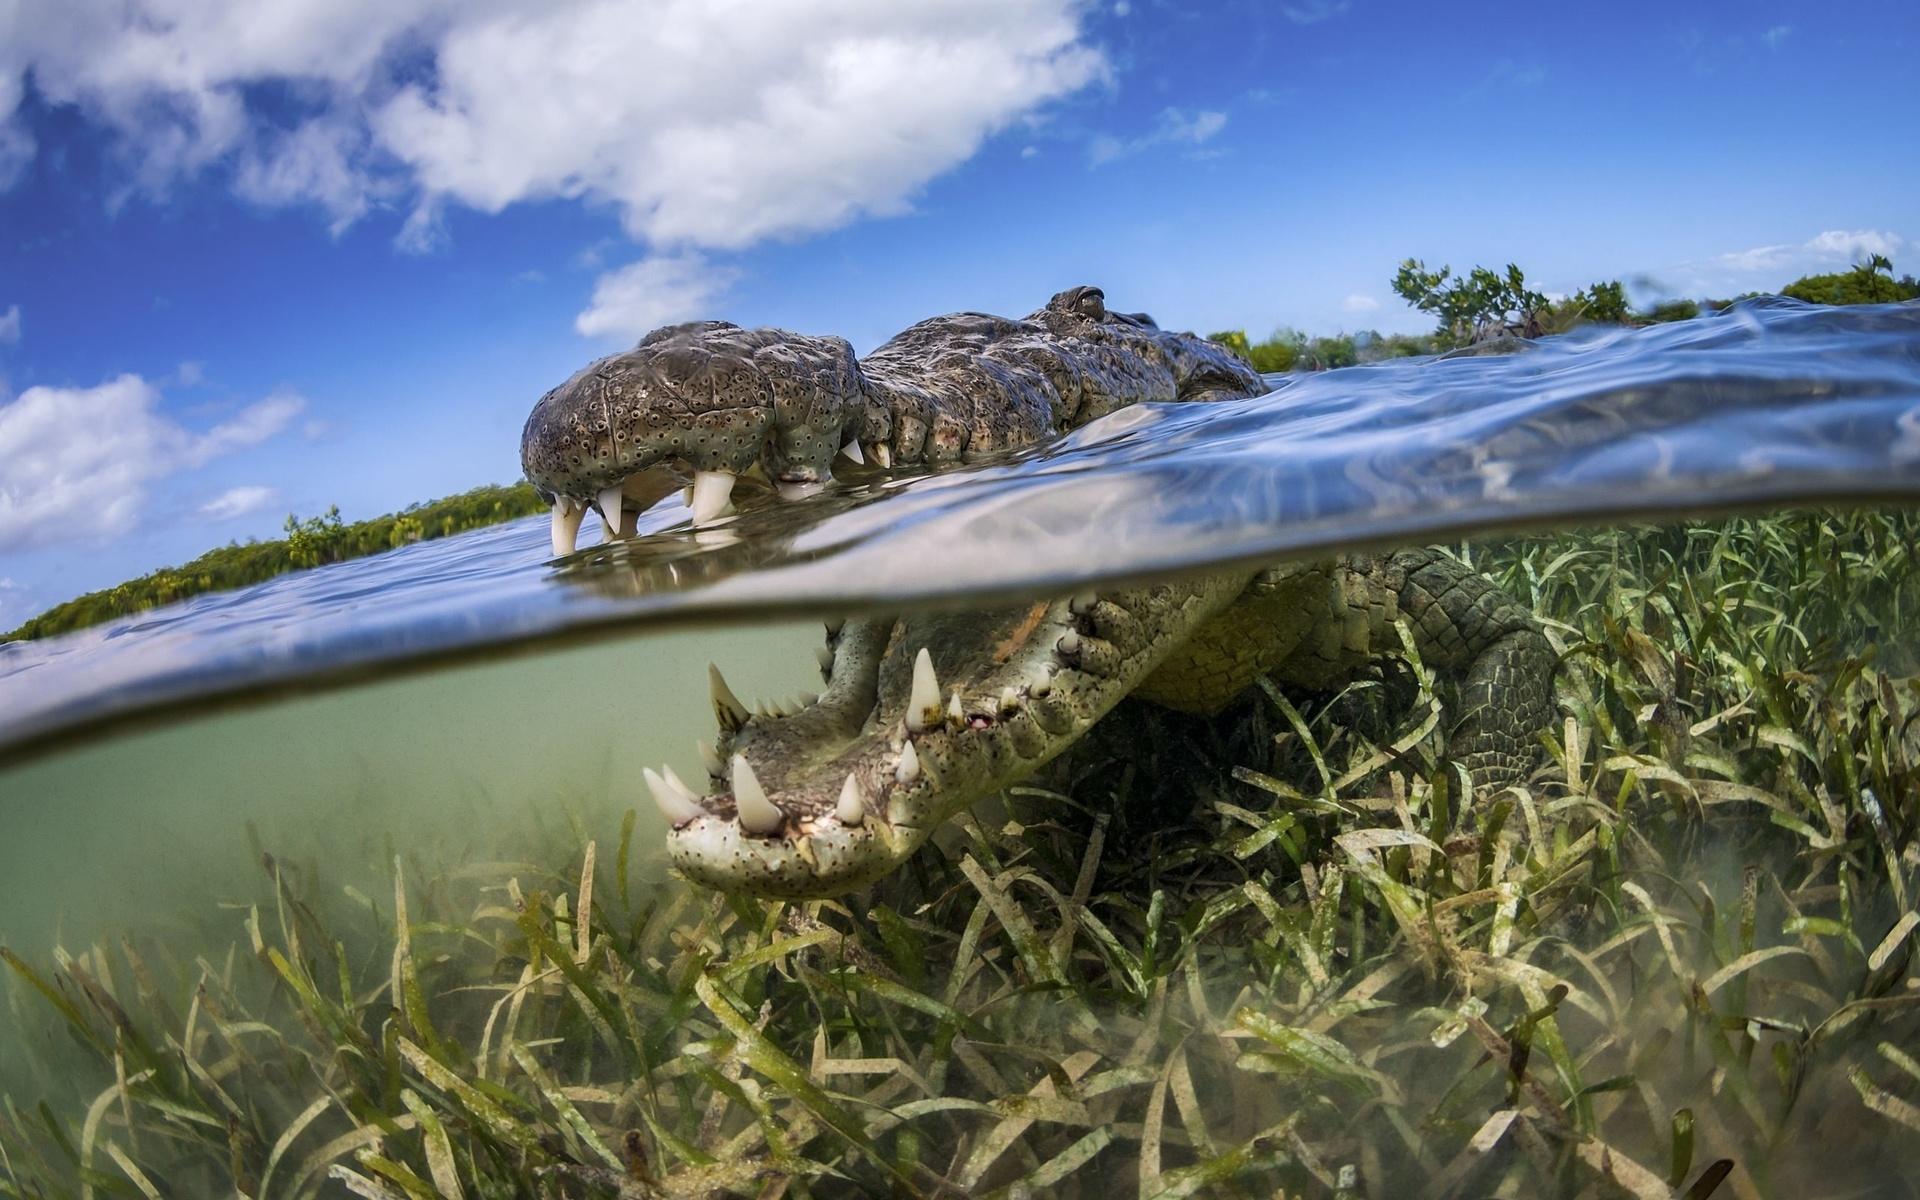 крокодил, рептилия, хищник, взгляд, фото, под водой